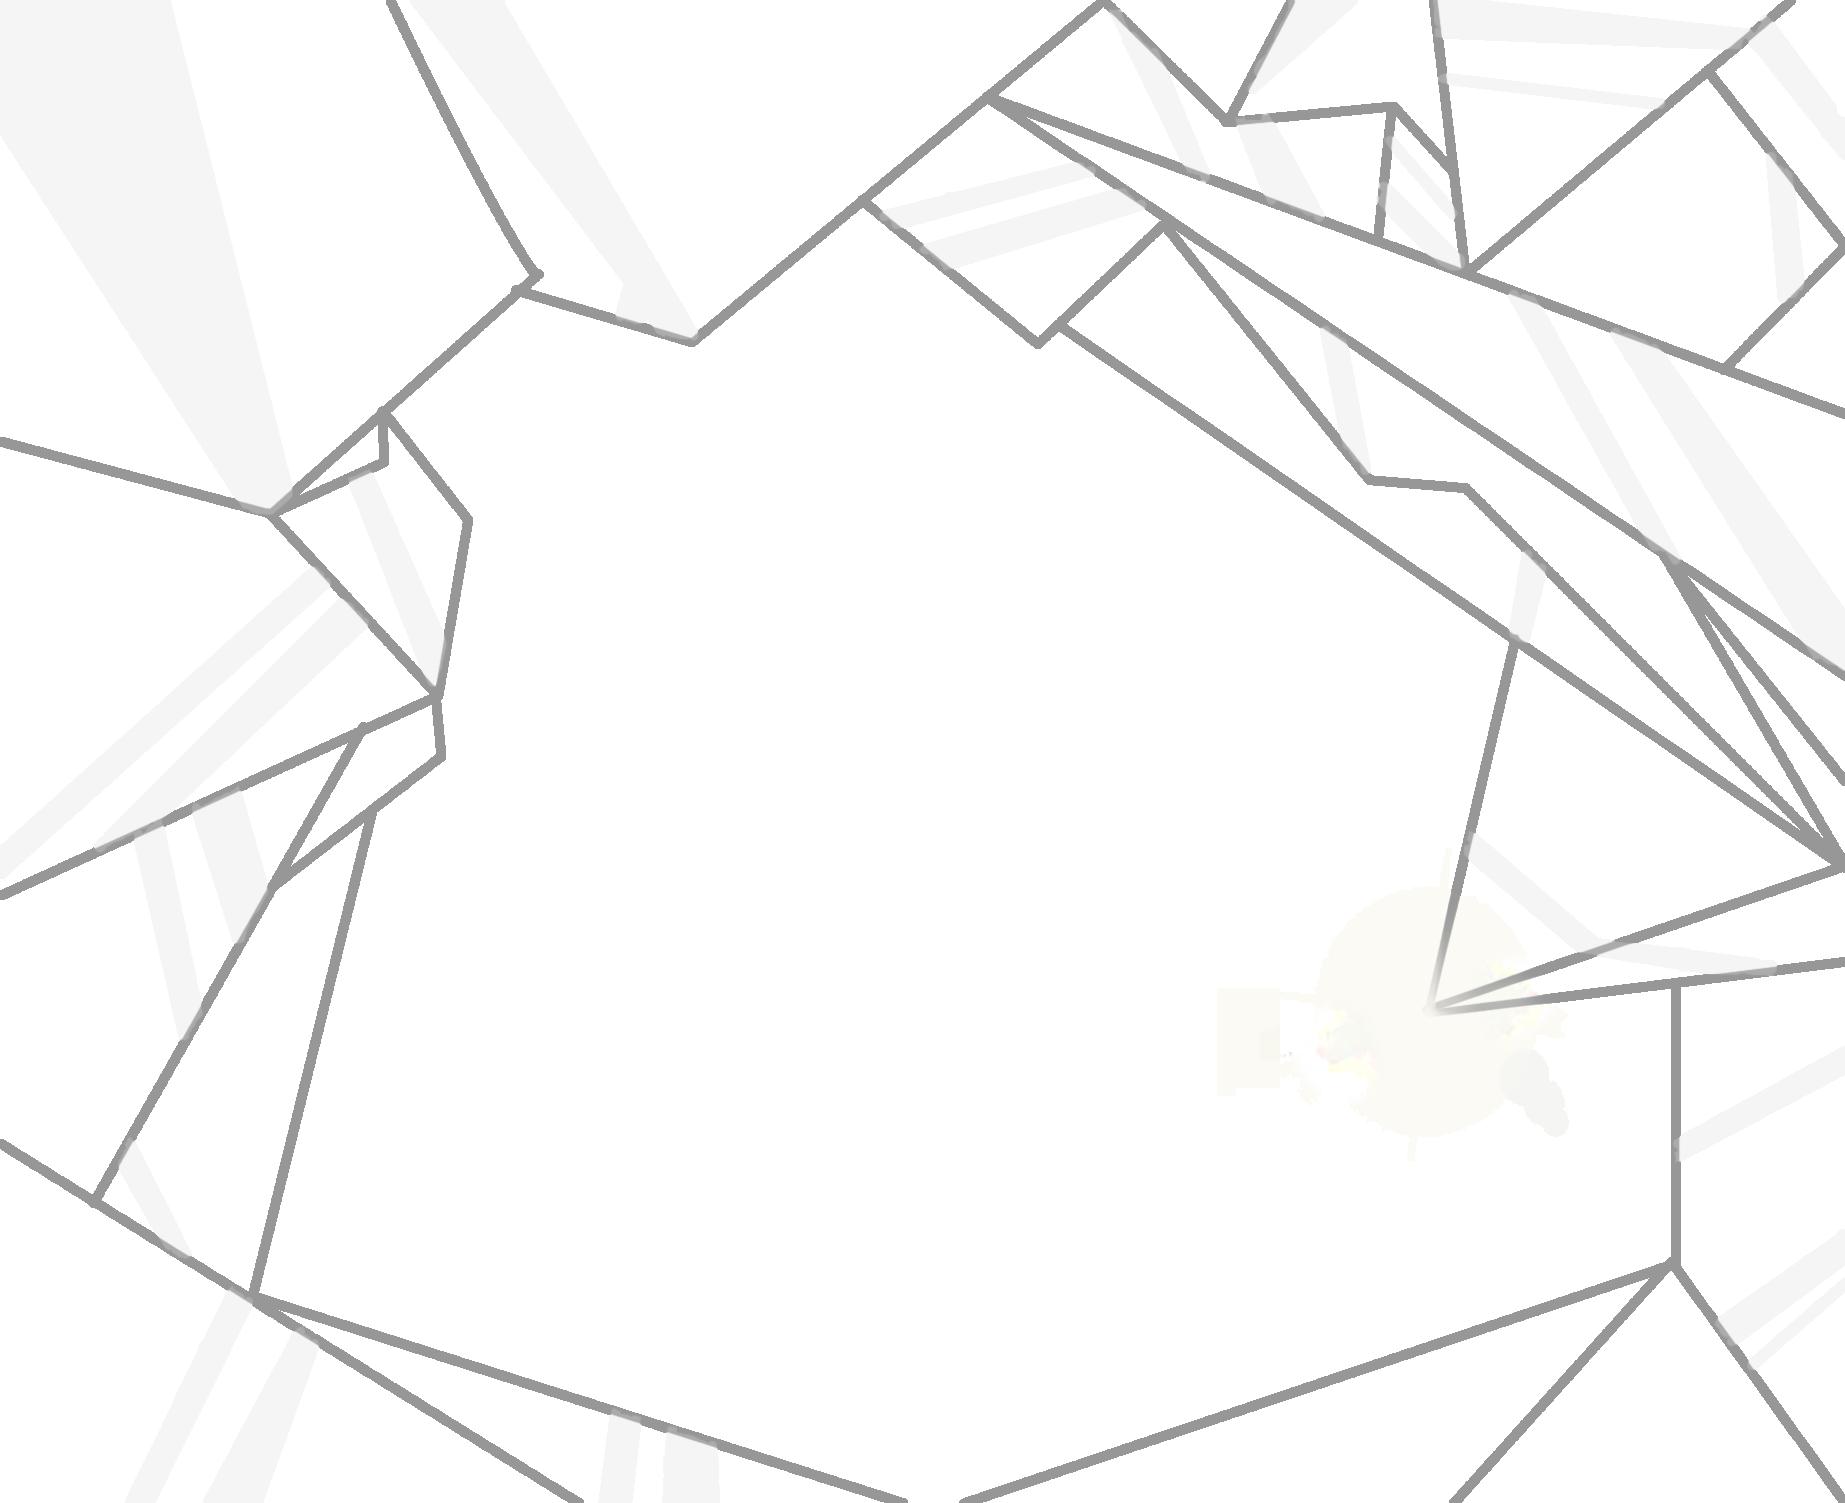 Broken Screen Effect by Tempestwulf on DeviantArt